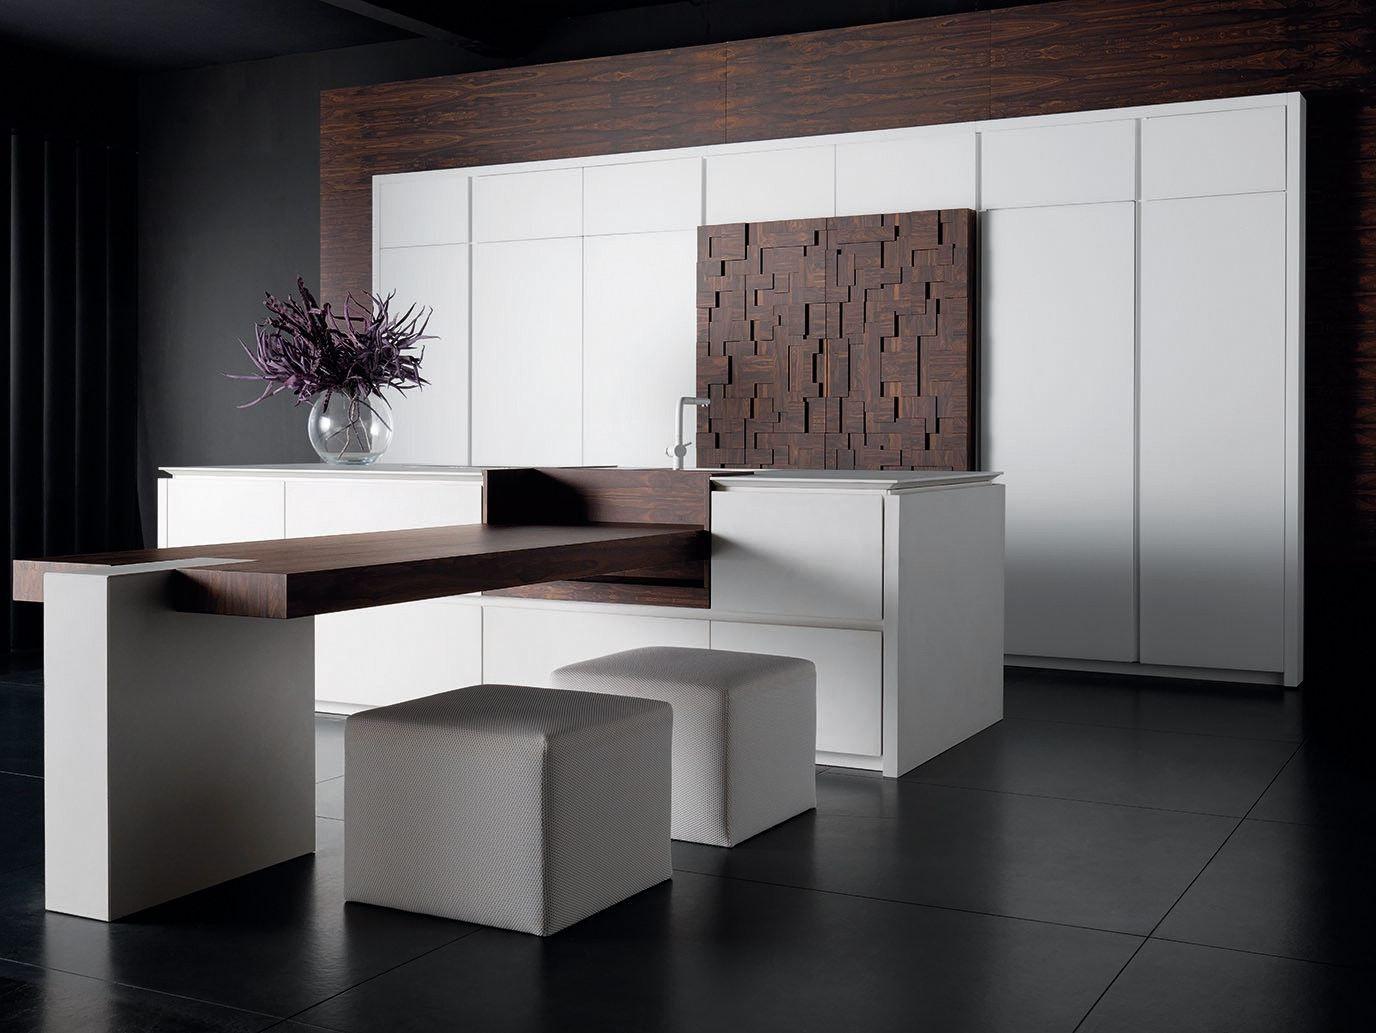 Lacquered Kitchen With Island PRISMA By TONCELLI CUCINE Design Experientia